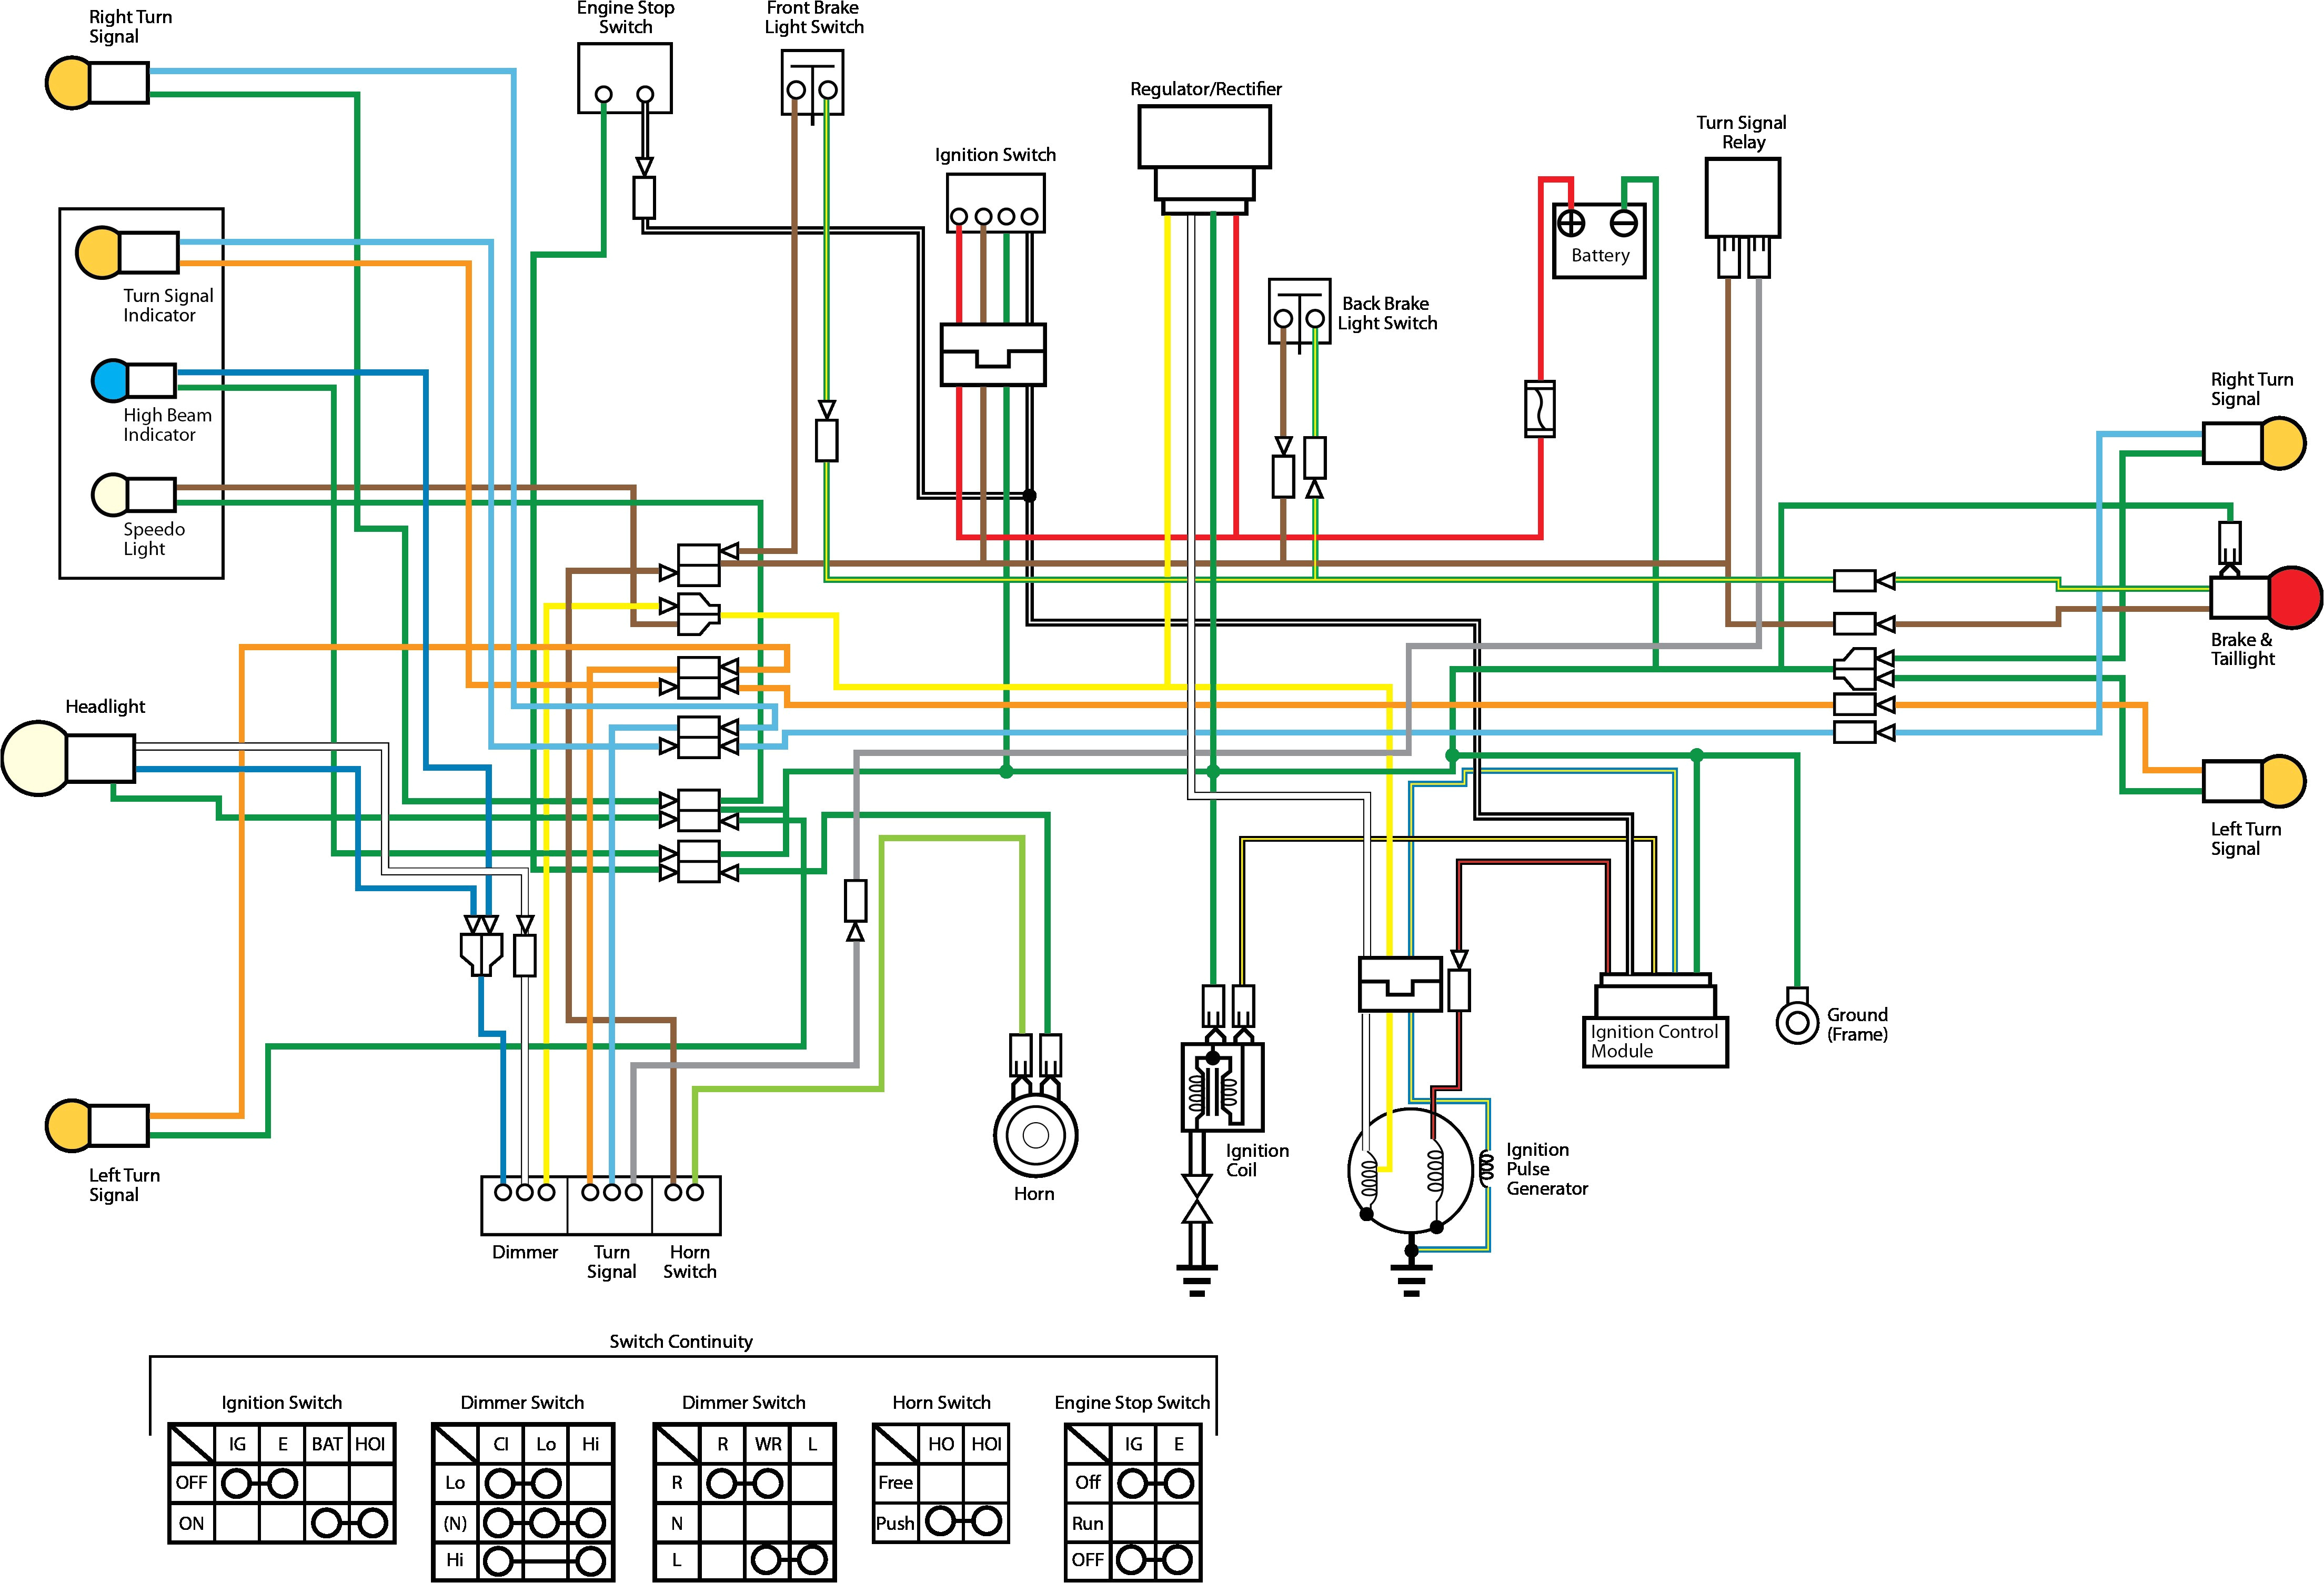 automotive wiring harness layout wiring diagram review car stereo wiring harness diagram car wiring harness diagram